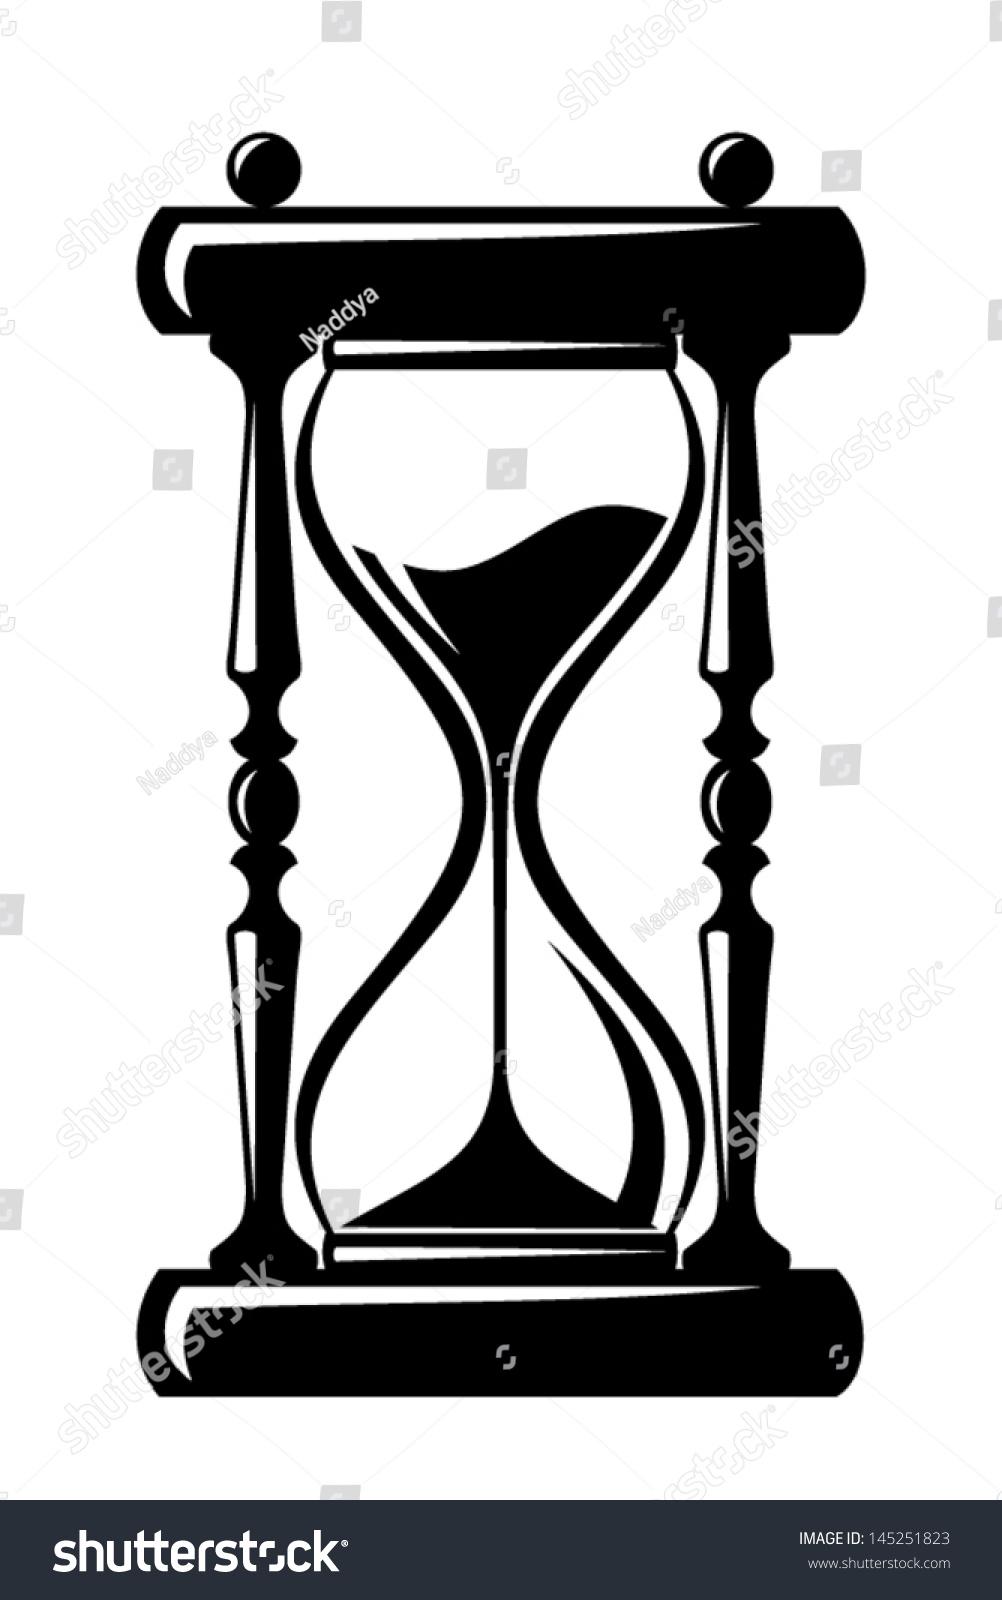 Hourglass vector black silhouette stock vector 145251823 hourglass vector black silhouette biocorpaavc Images